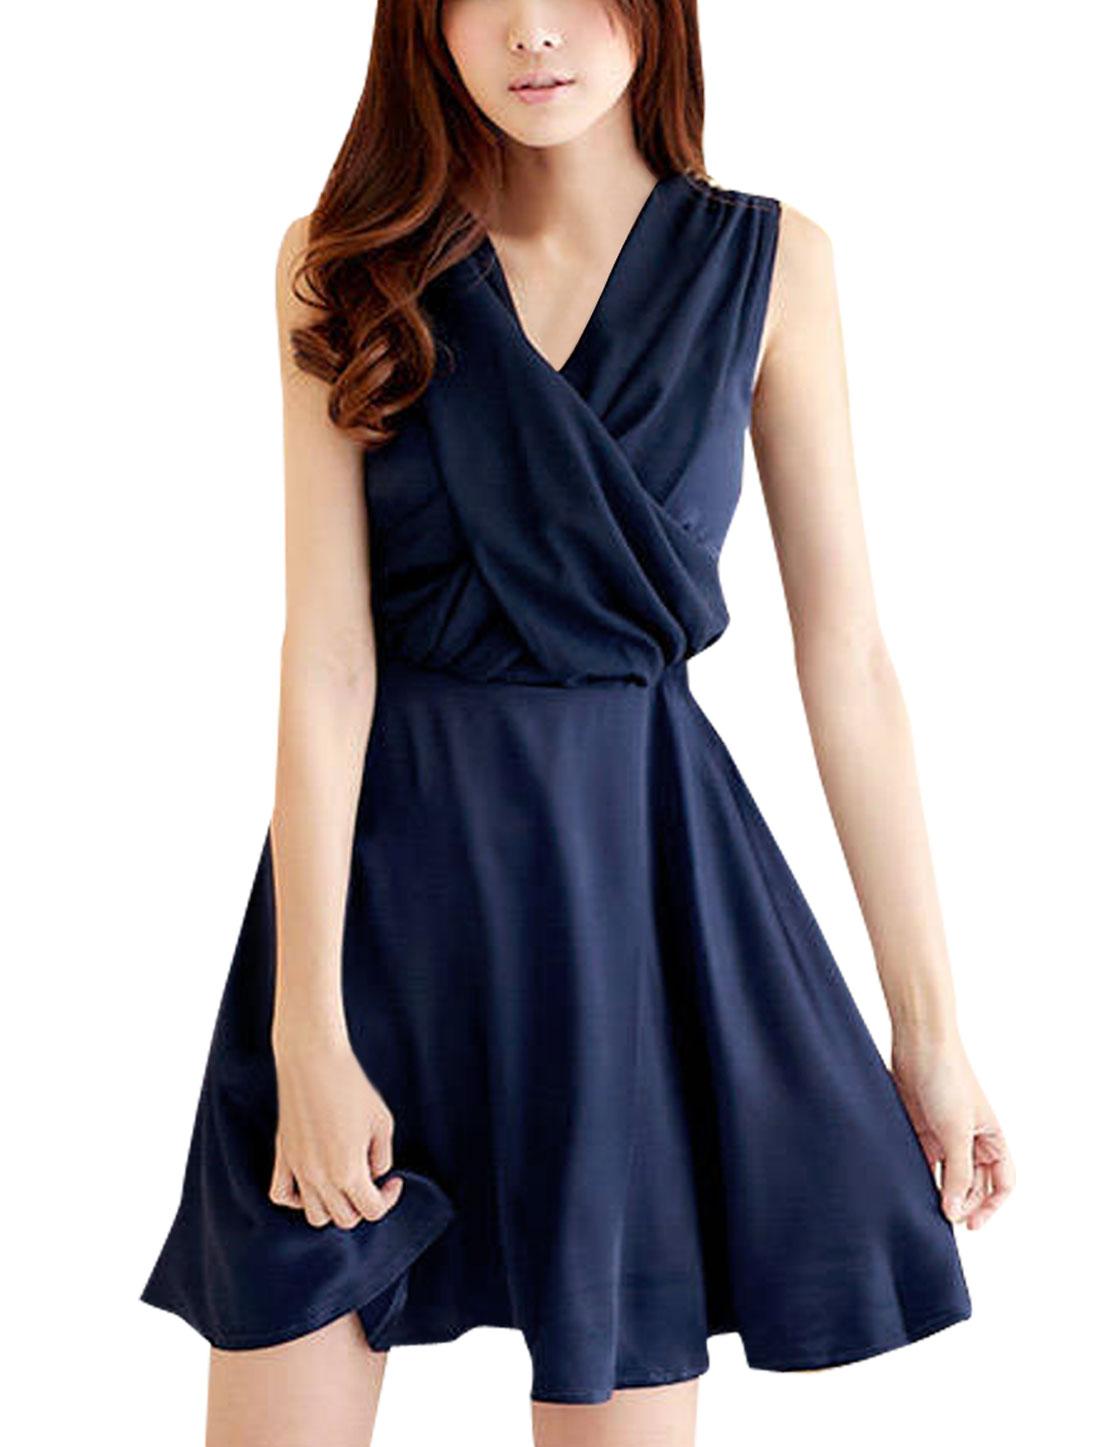 Dark Blue Cross V Neck Sleeveless Smocked Back Mini Dress XS for Lady